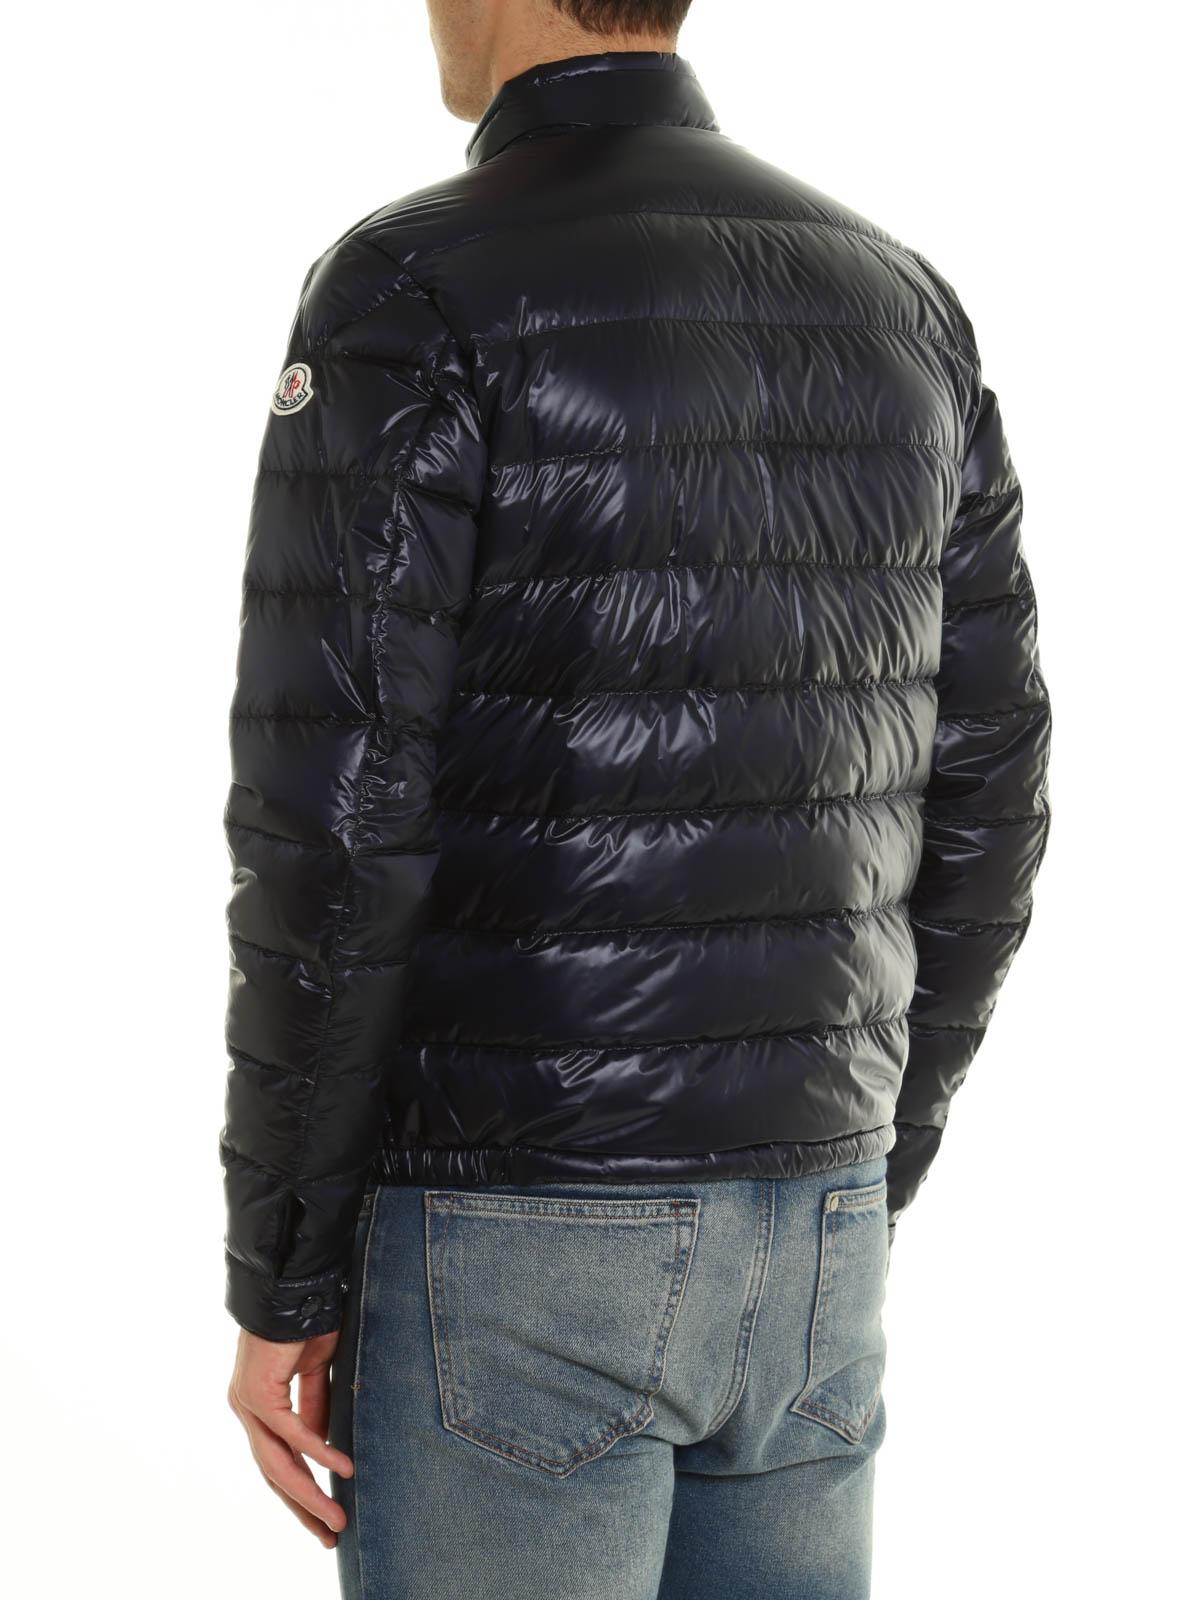 info for 031a6 f67a8 Moncler - Piumino leggero Acorus - giacche imbottite - C1 ...